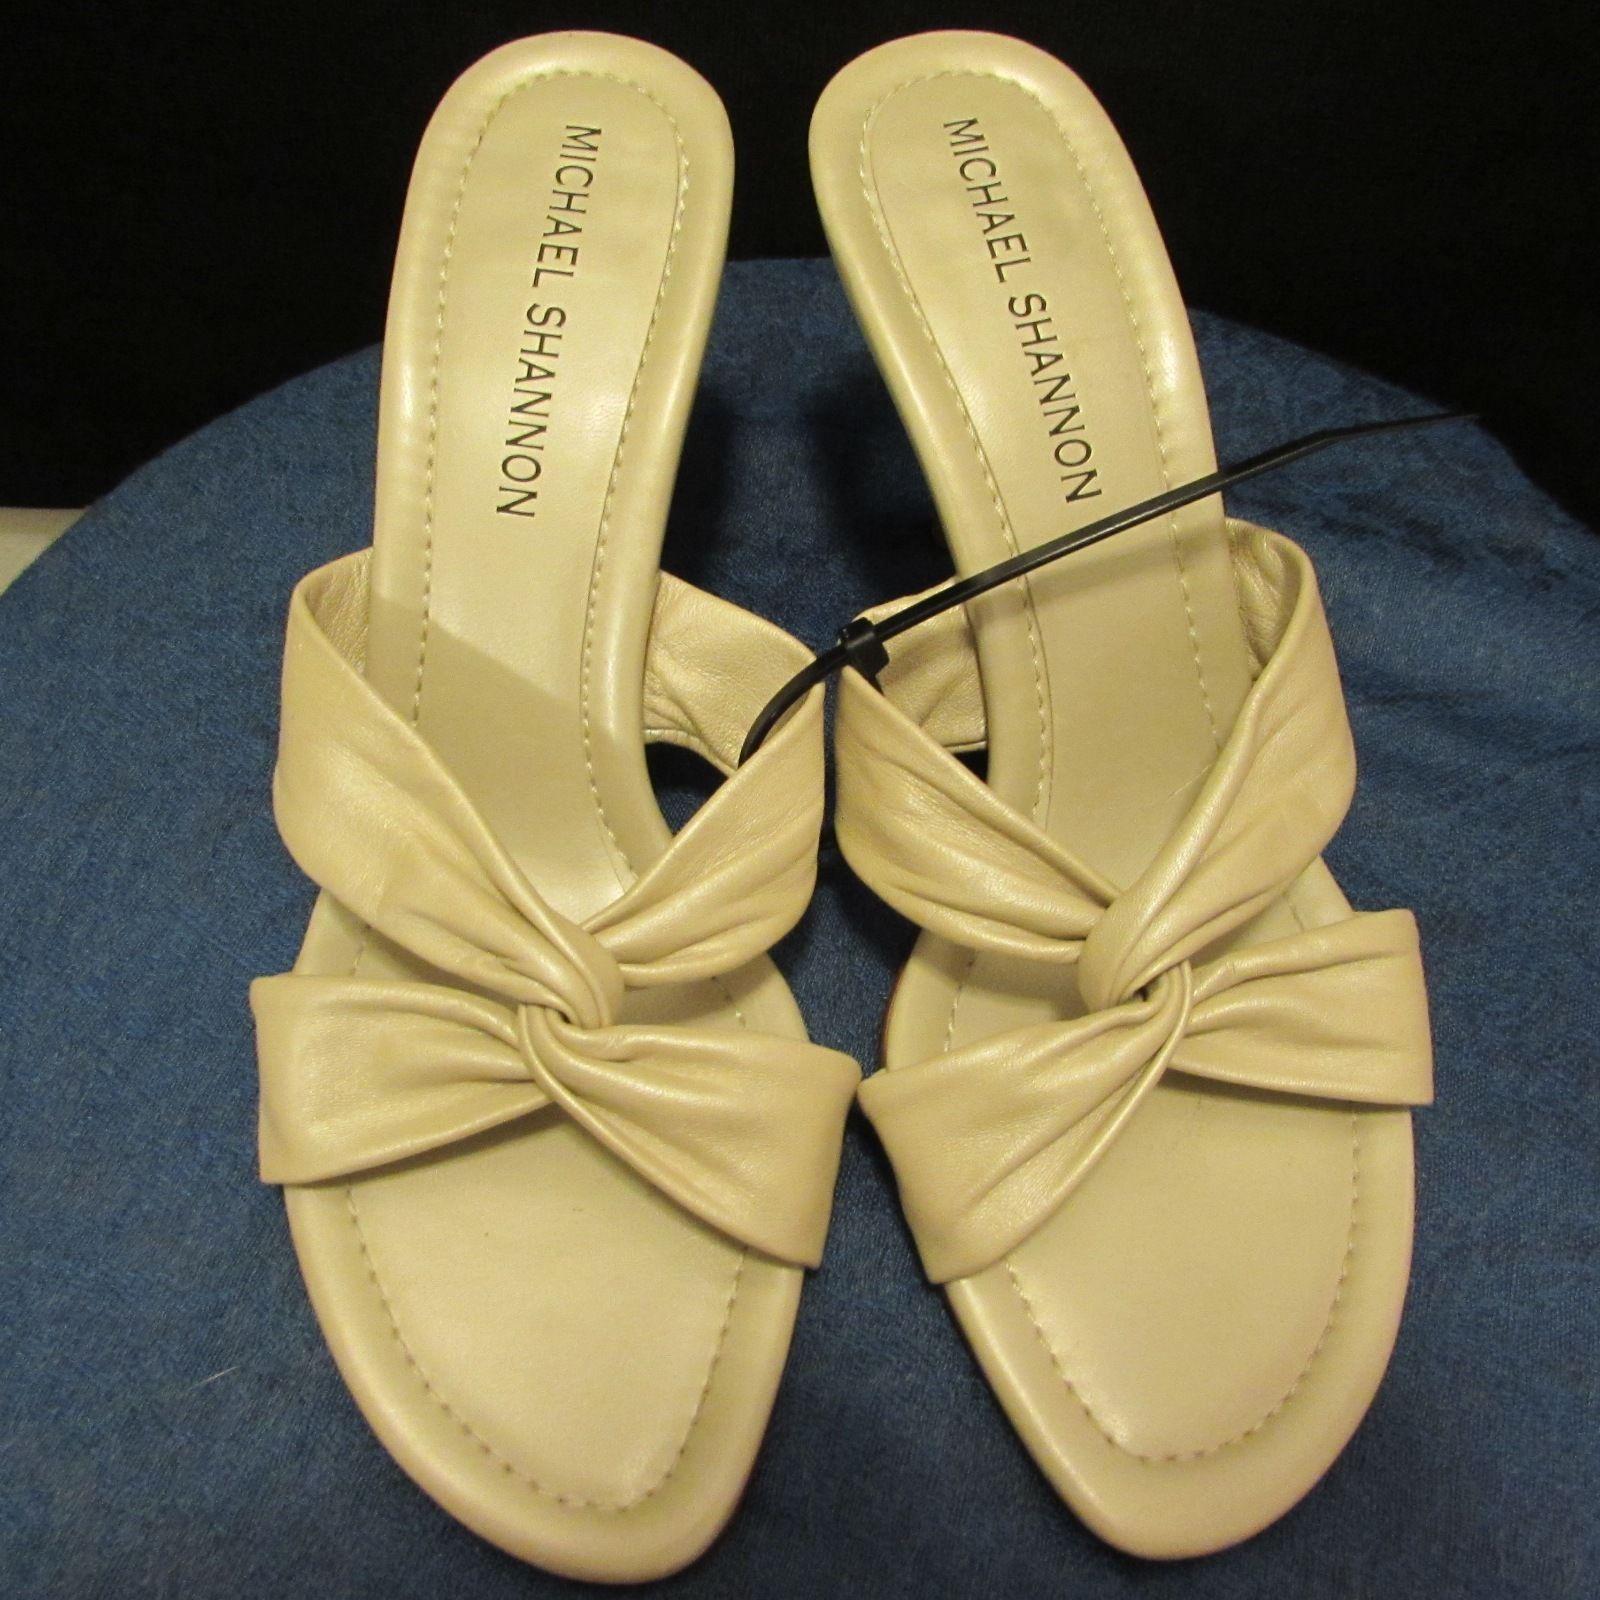 Michael Shannon Women's Beige Leather Sandal/High Heels Size: 8.5 Medium (B,M)